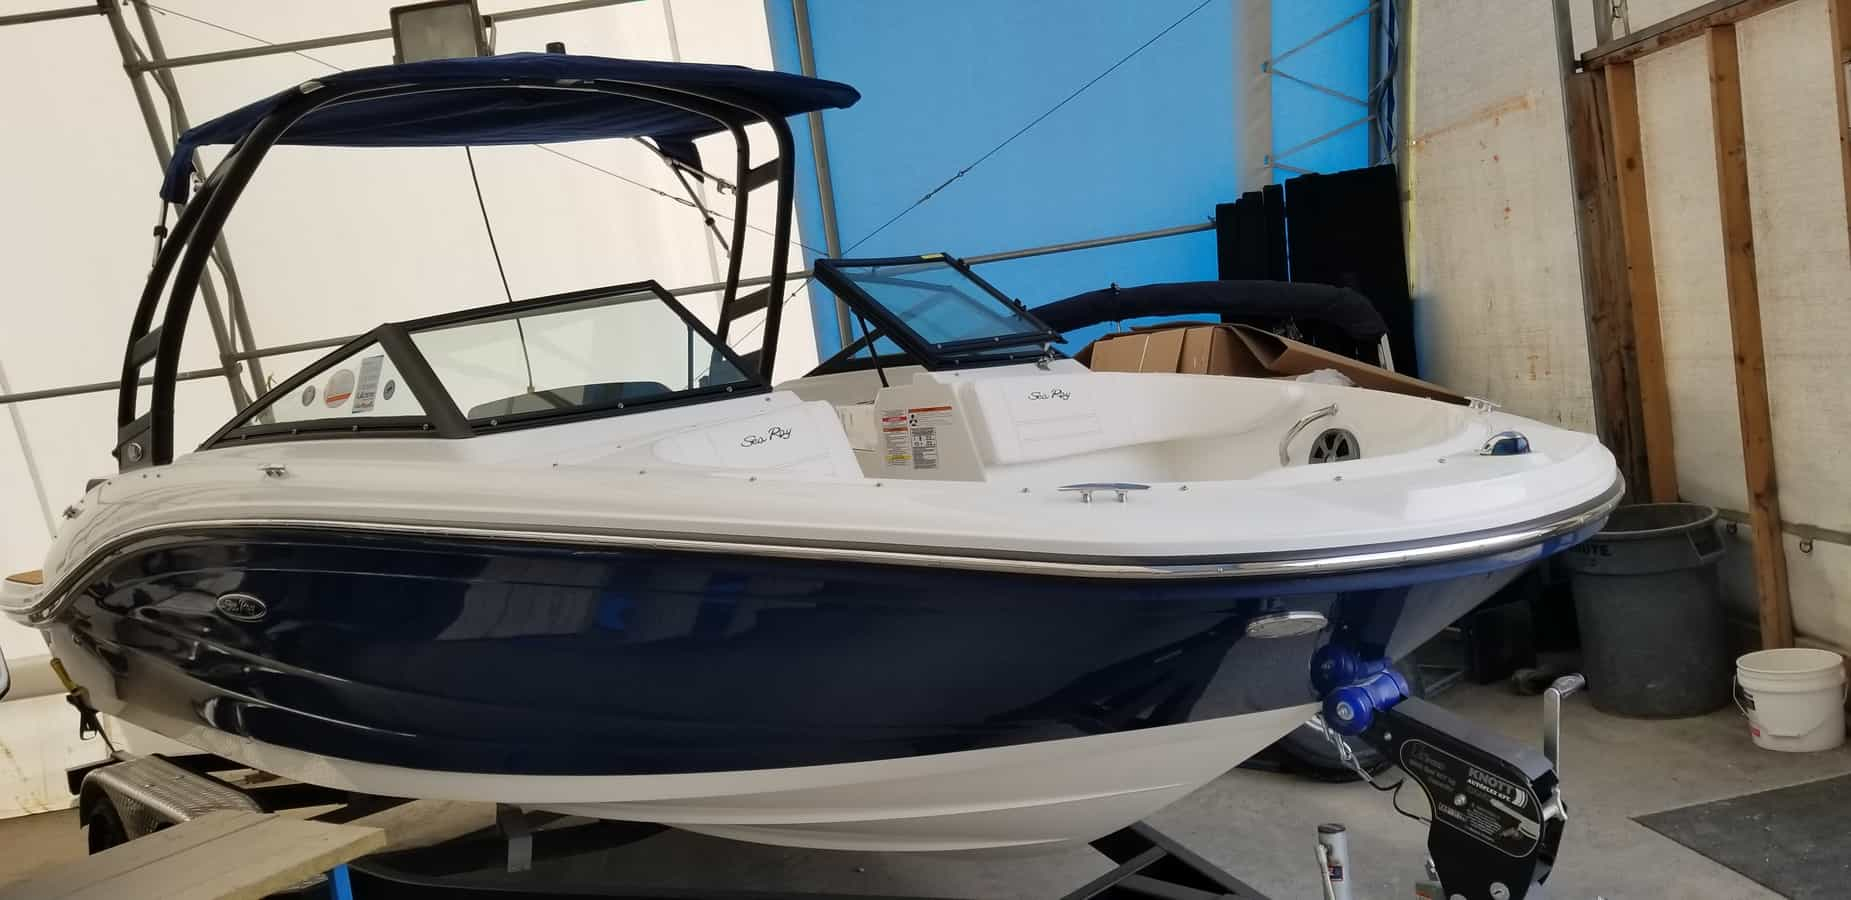 NEW 2019 Sea Ray SPX 190 Elevation Edition - Shipwreck Marine